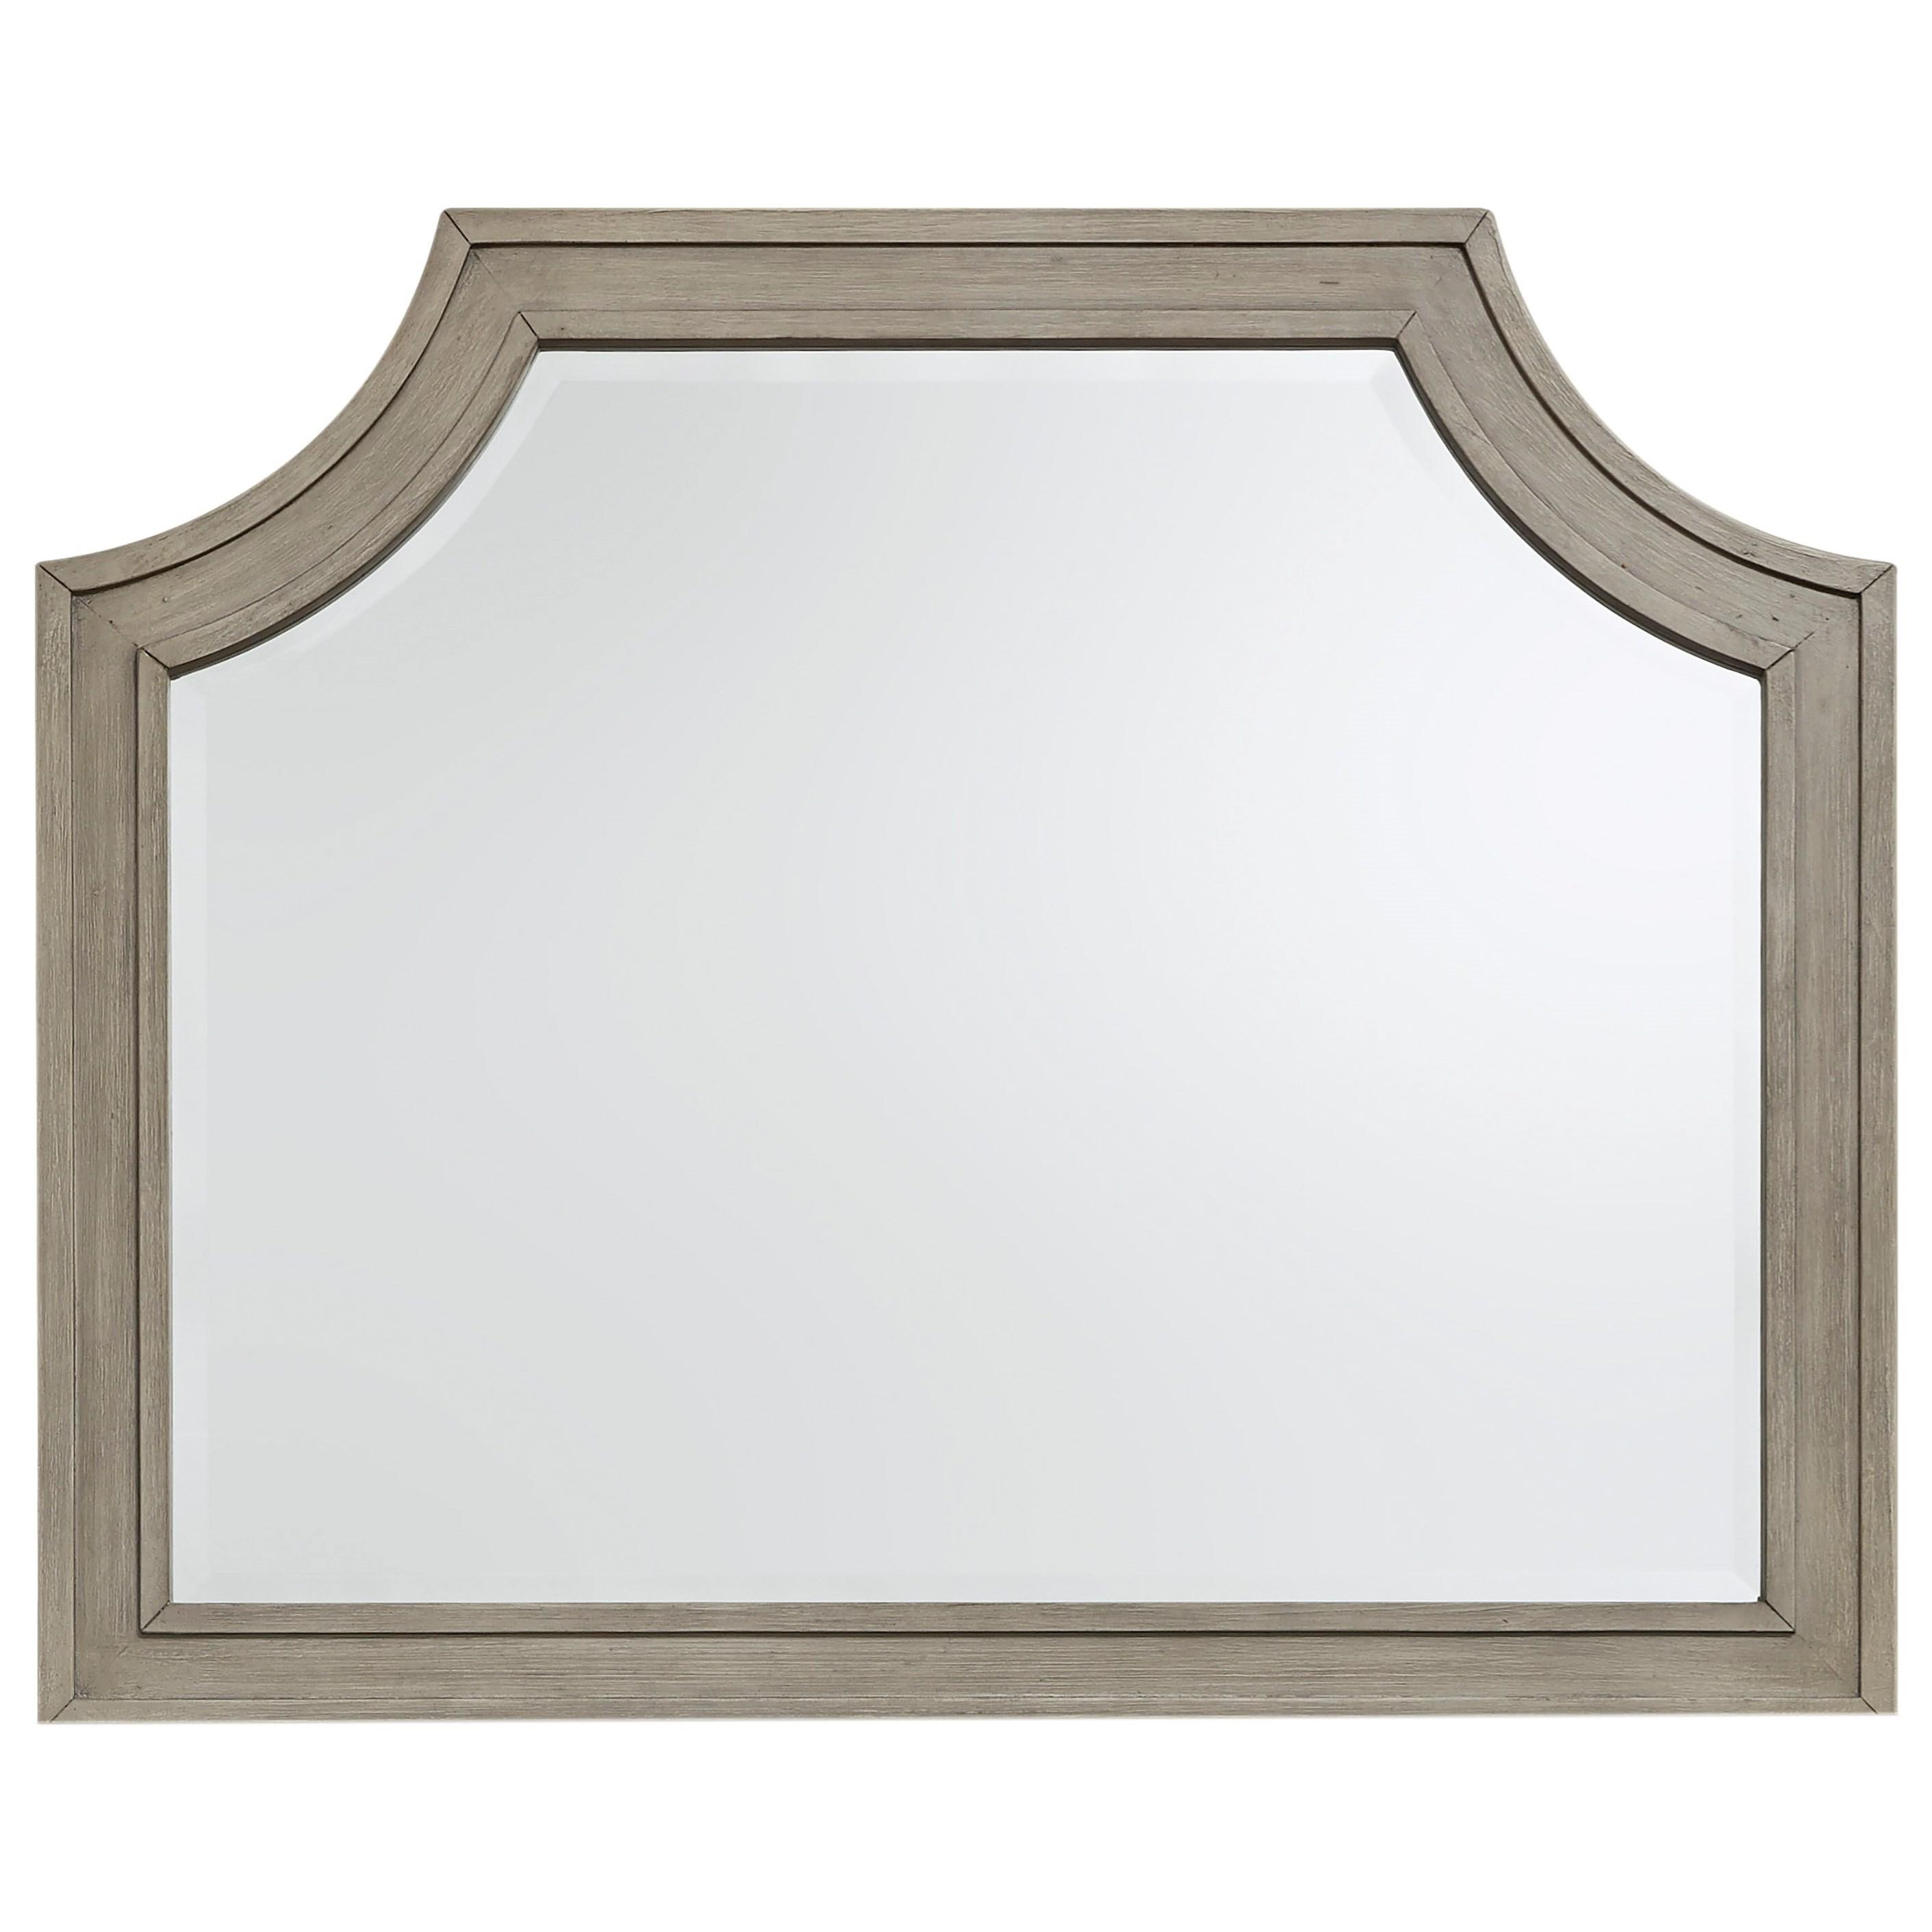 Falkhurst Bedroom Mirror by Benchcraft at Walker's Furniture